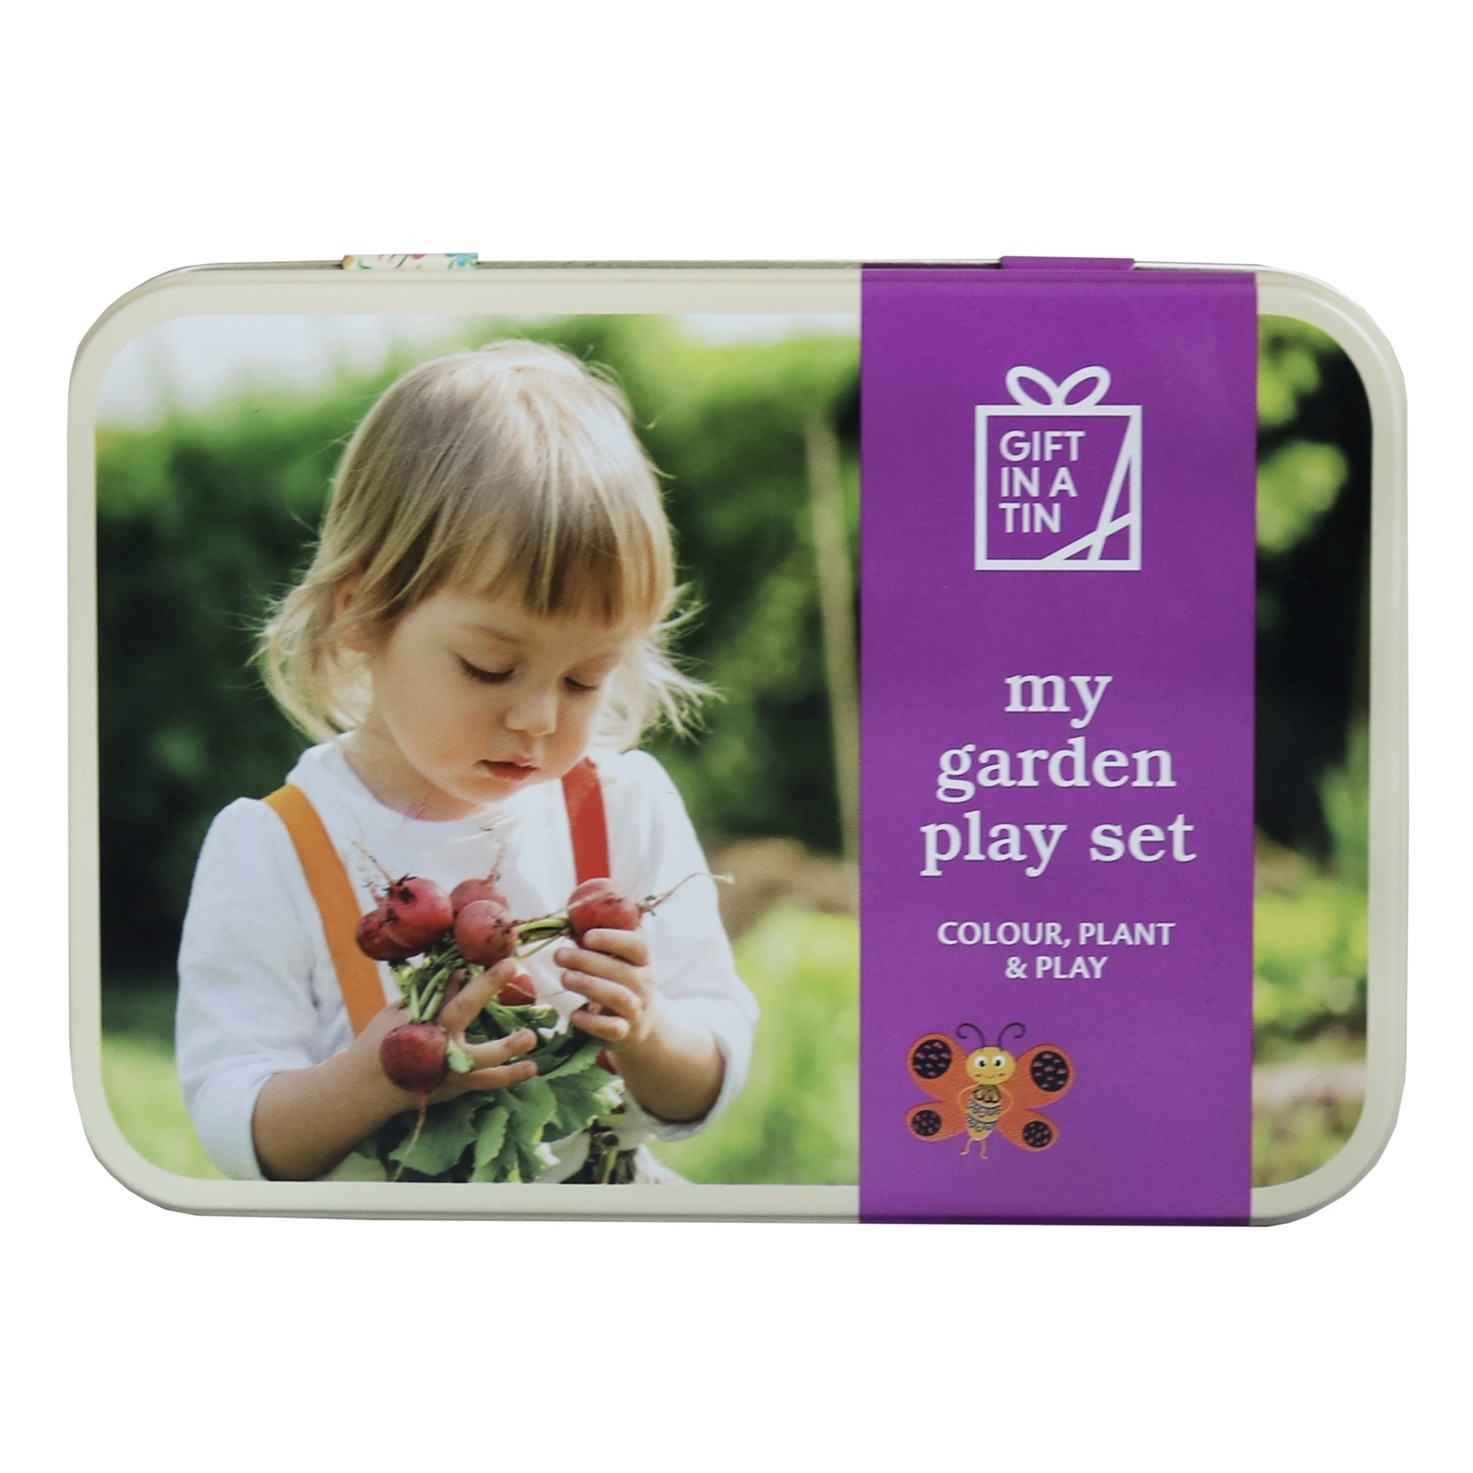 'My Garden Play Set' Gift in a Tin